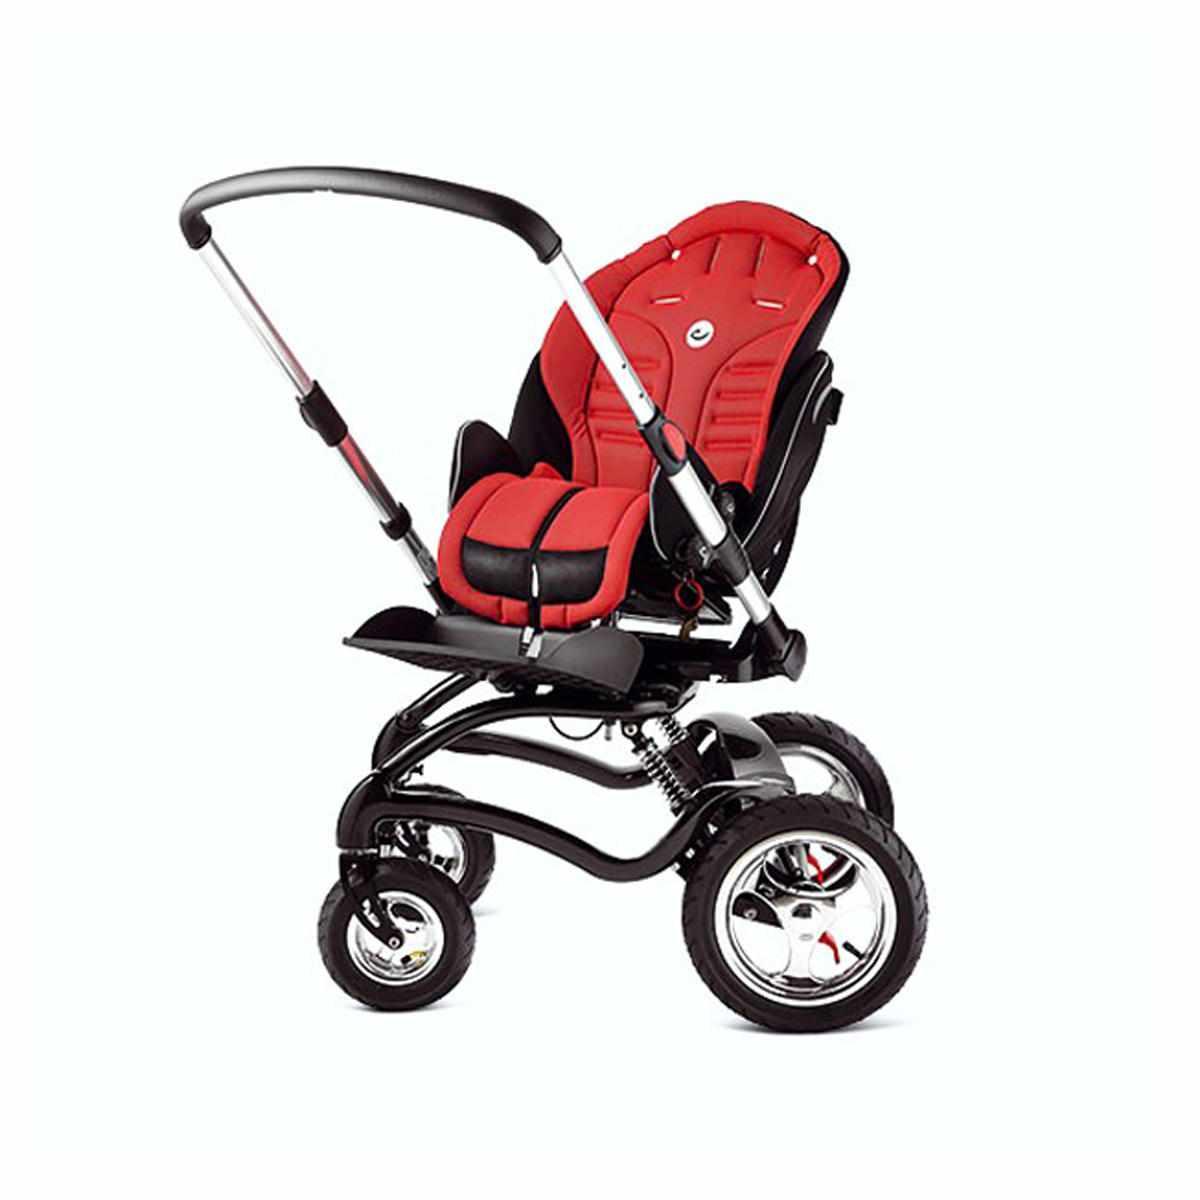 R82 Stingray stroller